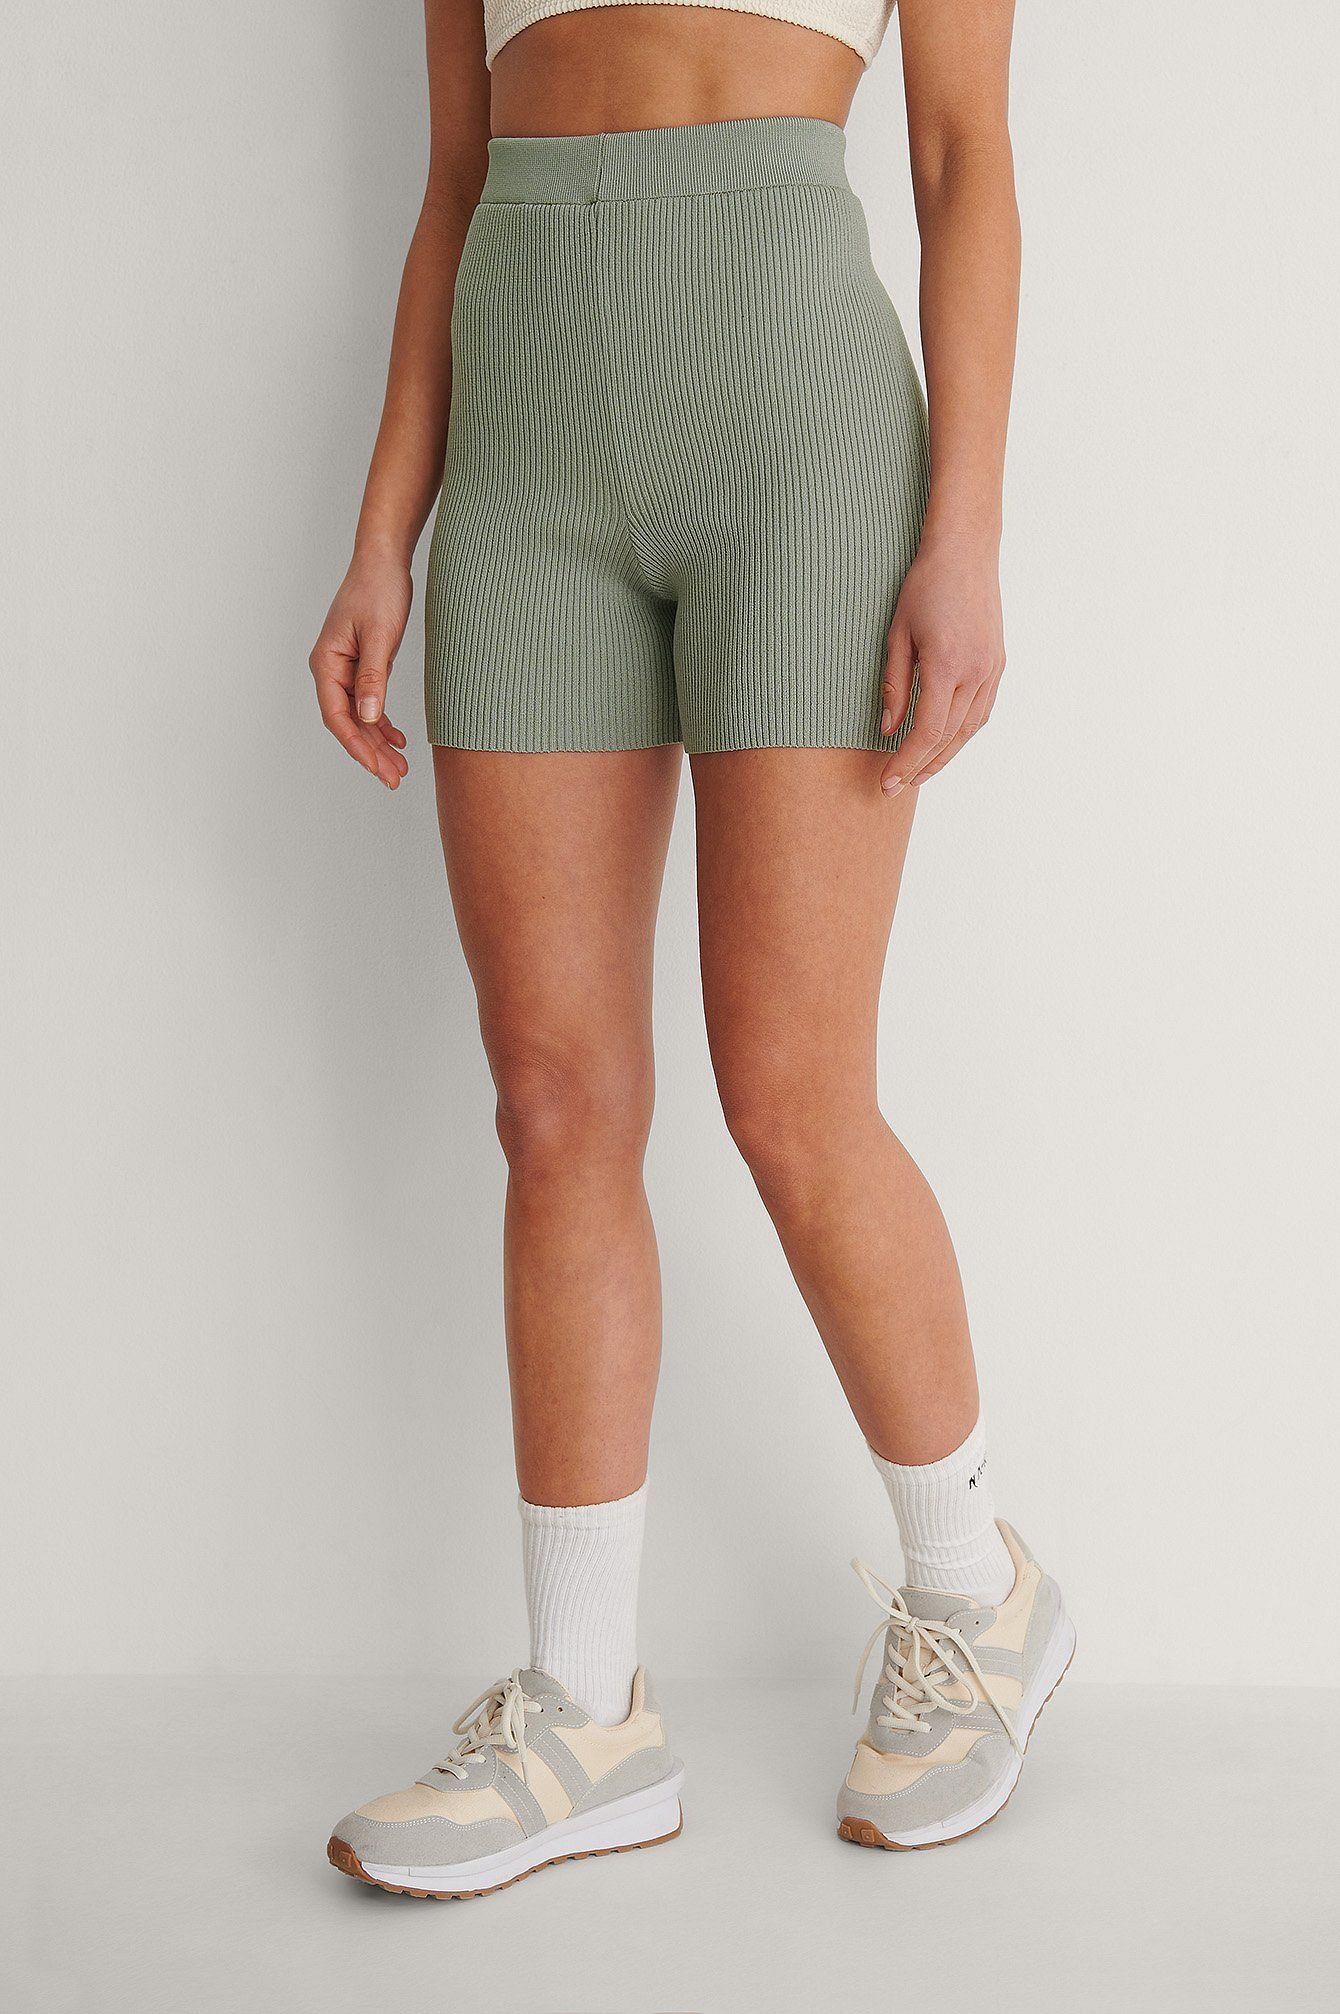 Eng Anliegende Gerippte Strick-Shorts- 27,95 Euro